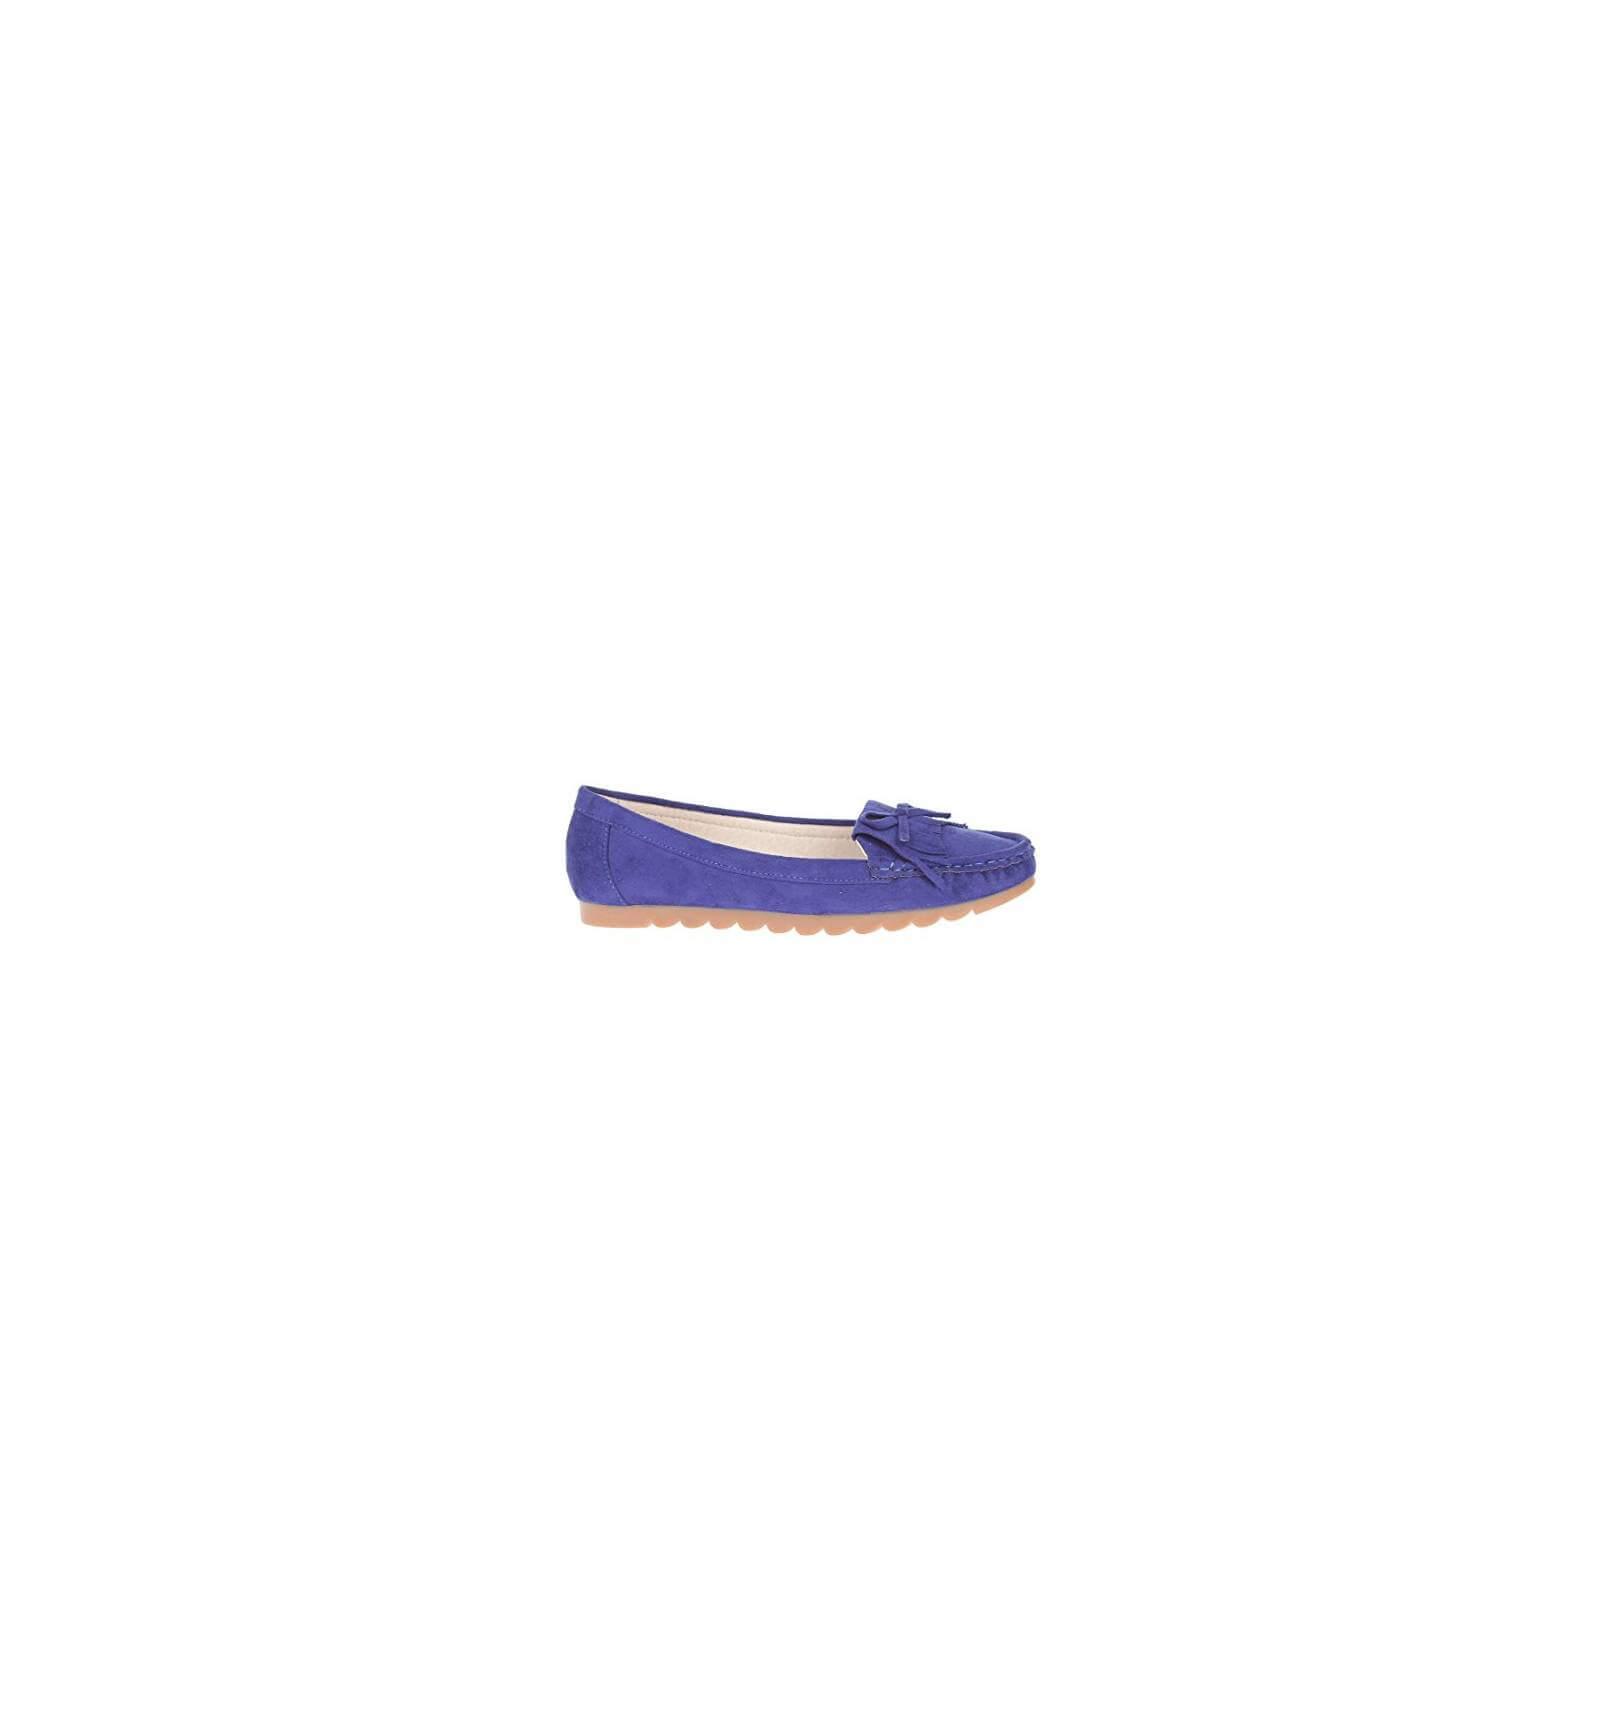 mocassin bleu lectrique pour femme confortable effet daim et franges. Black Bedroom Furniture Sets. Home Design Ideas